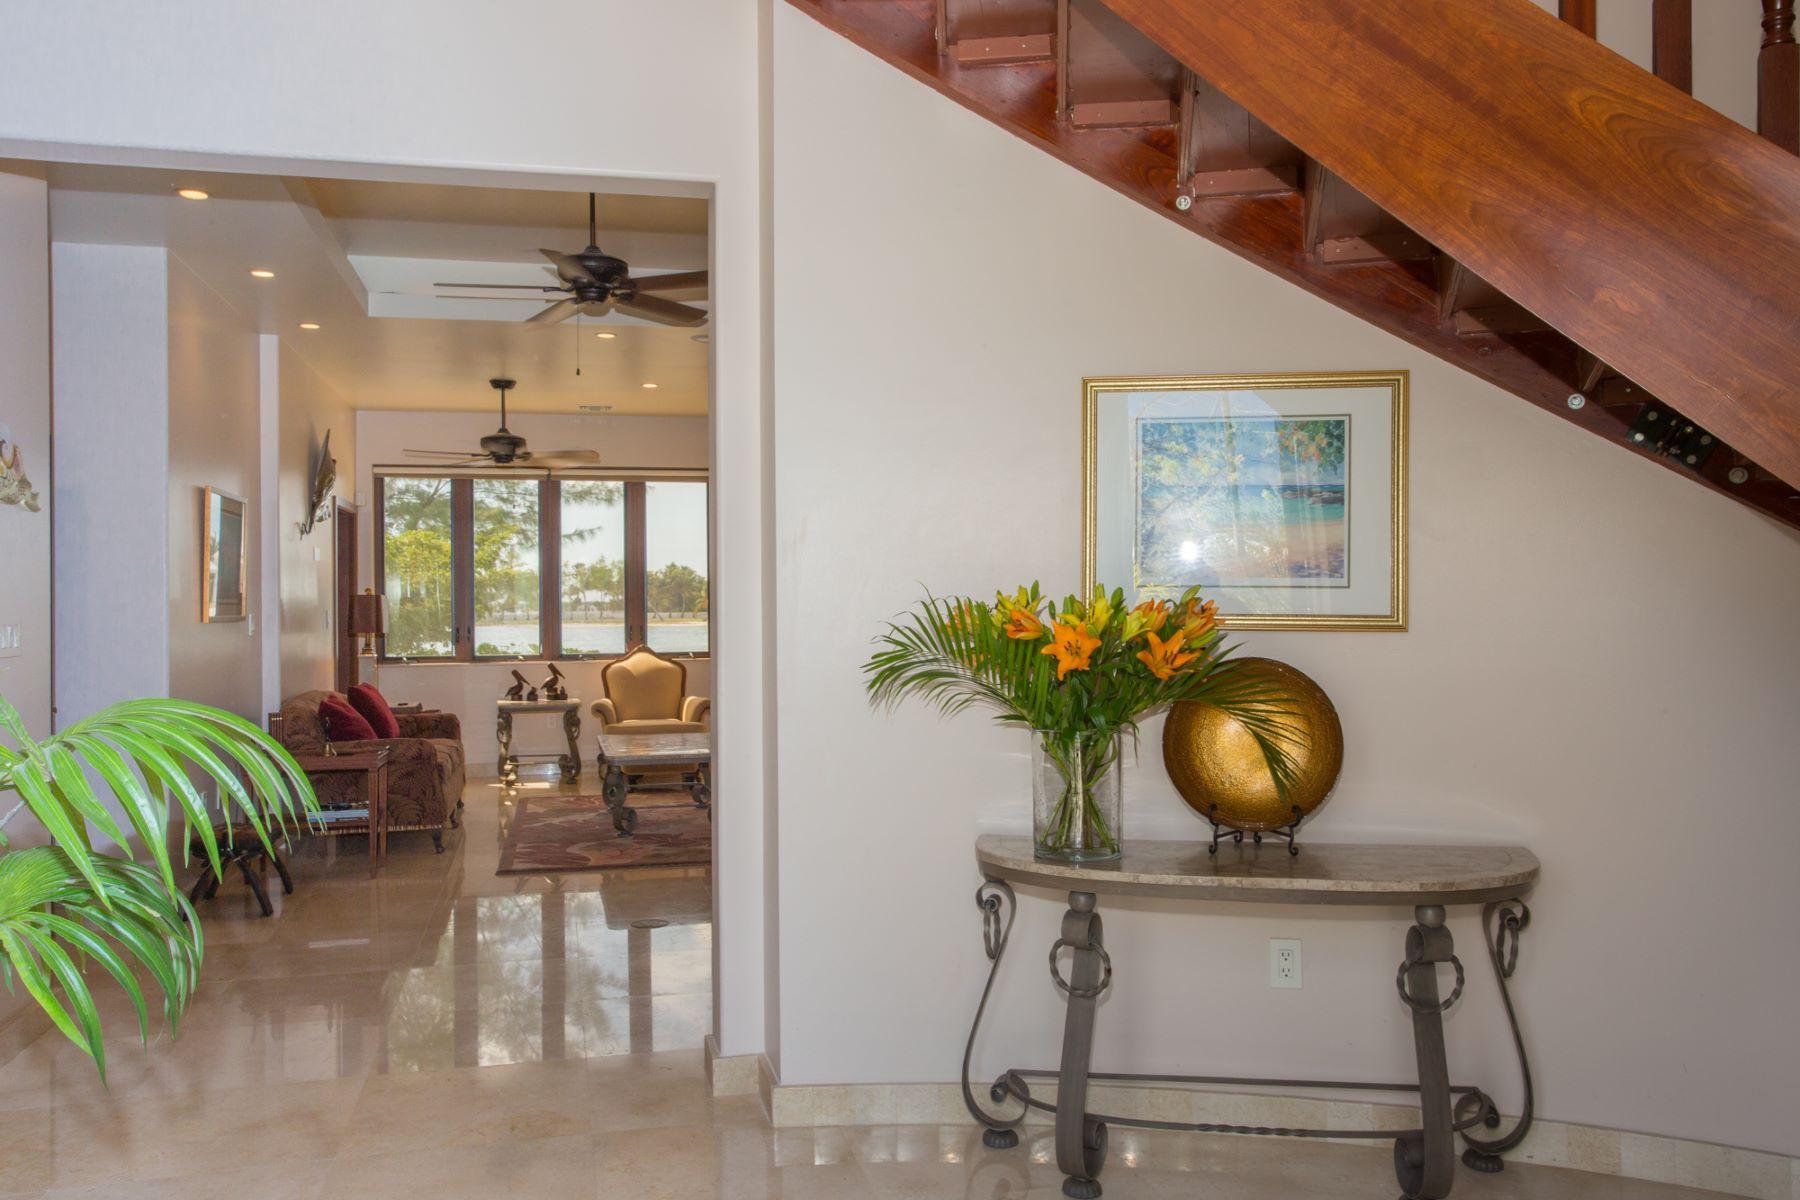 Additional photo for property listing at Casuarina Cove Sand Point Rd Rum Point, Gran Caimán KY1 Islas Caimán